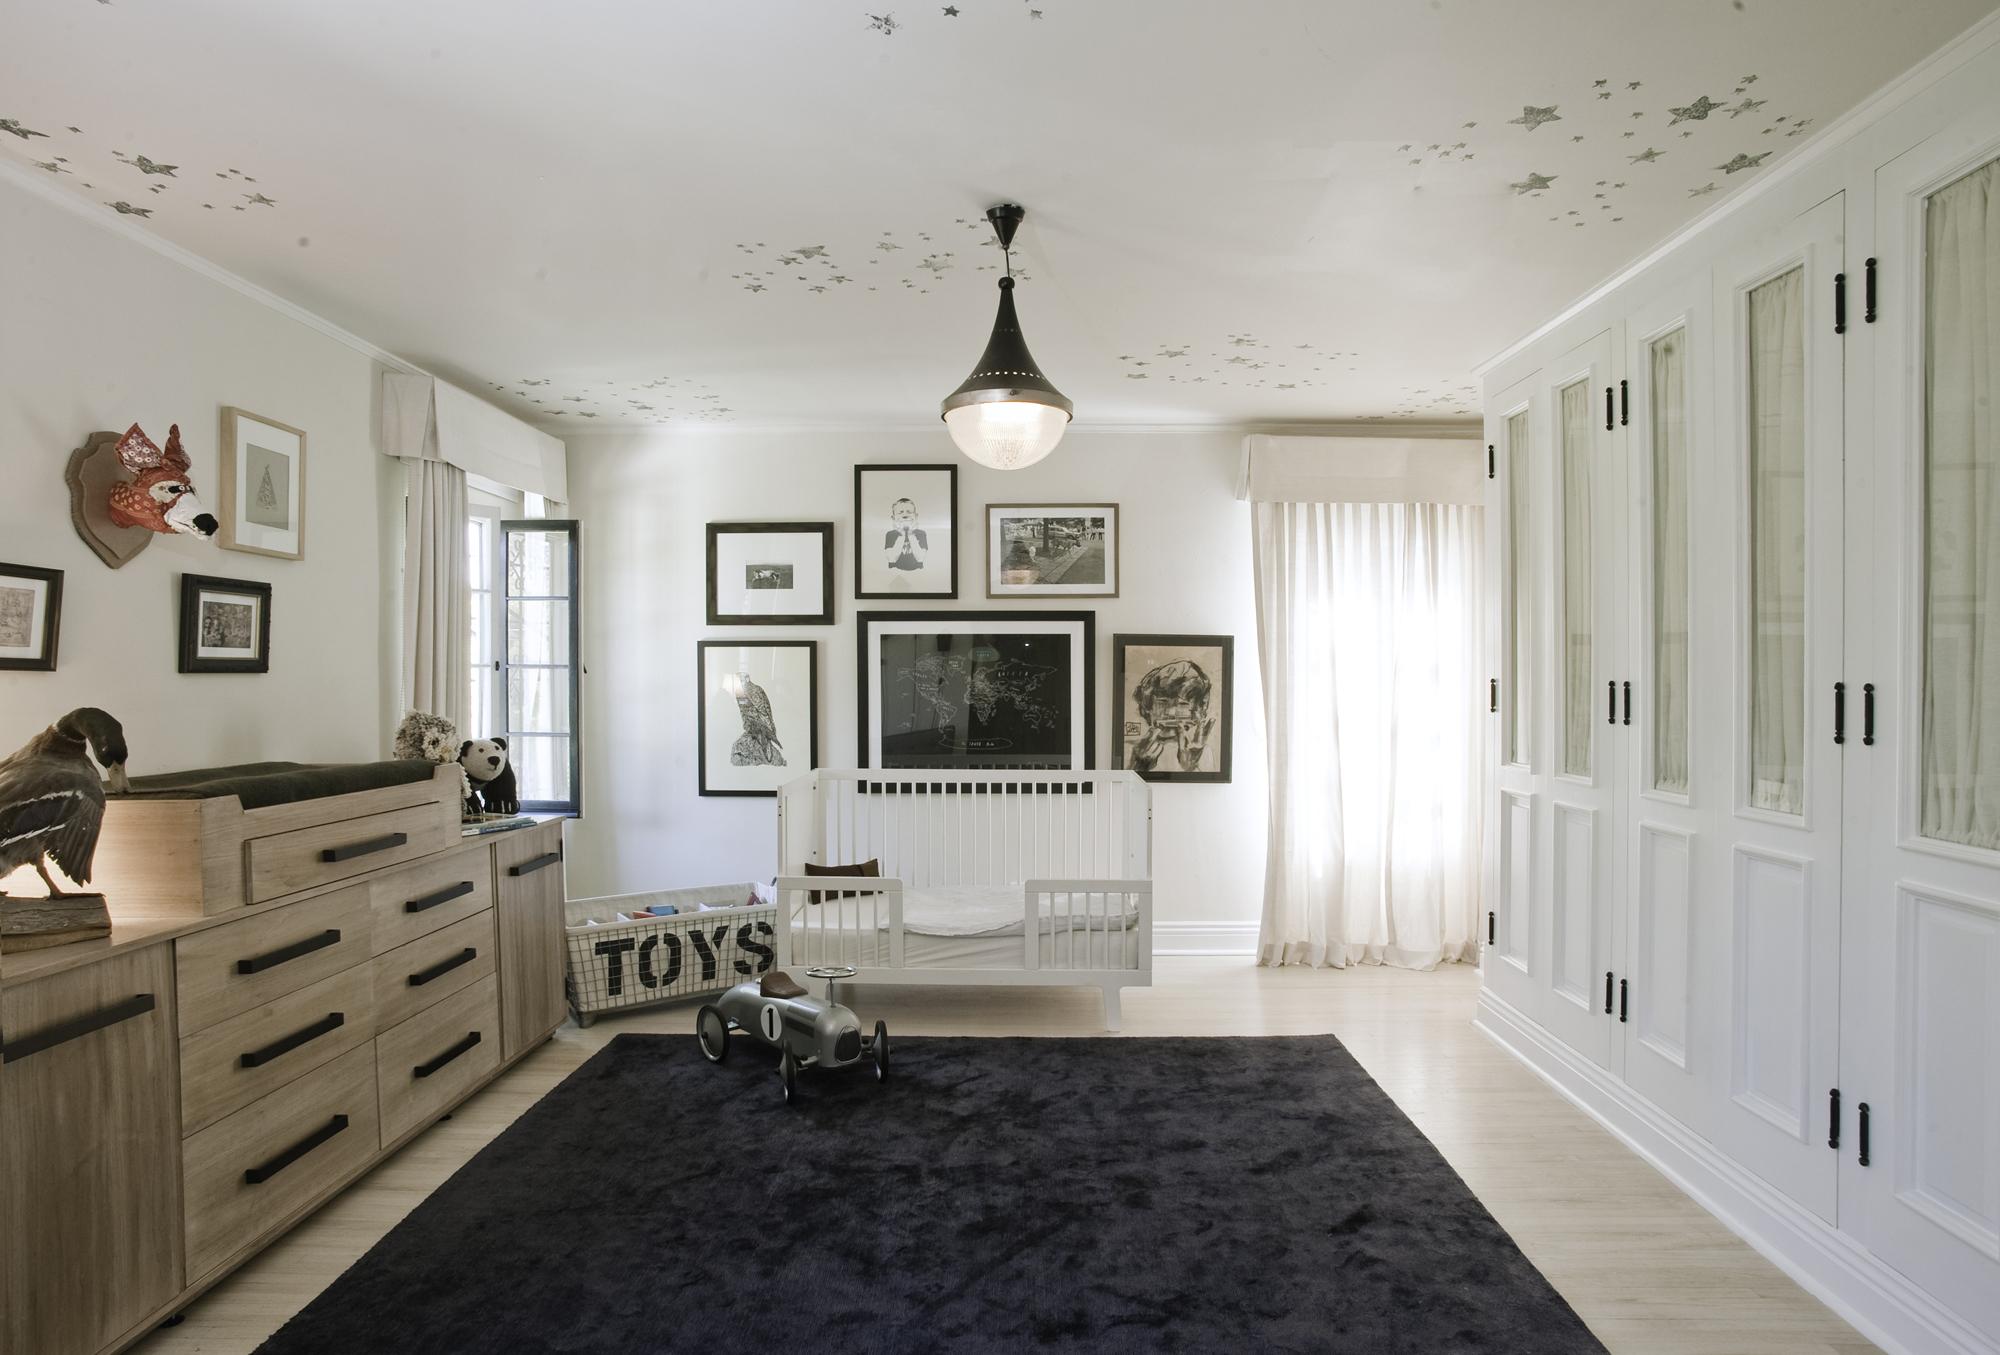 Teddy's Room